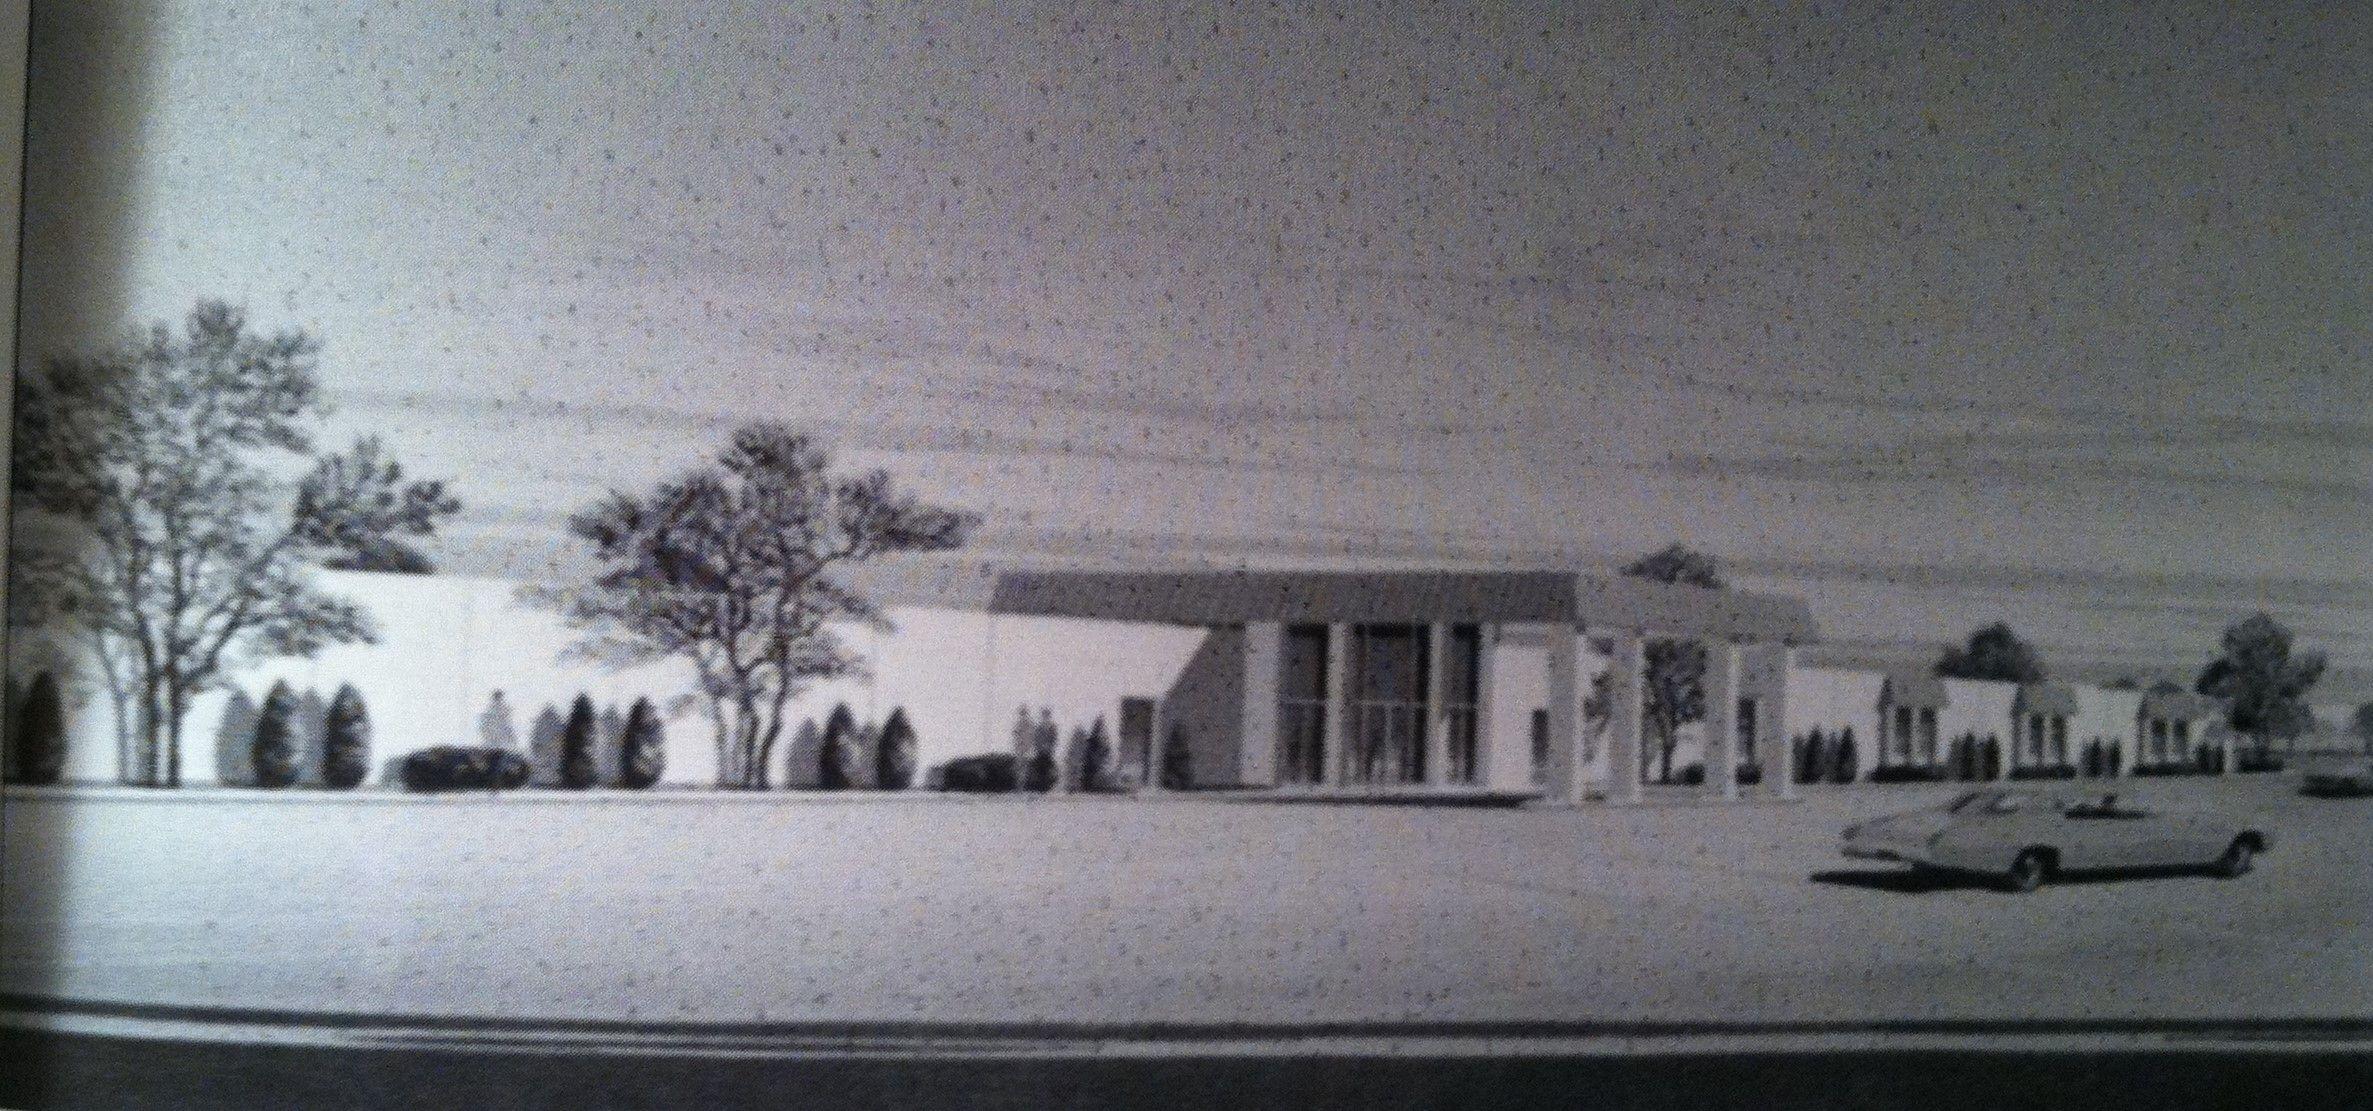 Westgate Hospital and Medical Center at 4405 North Interstate 35